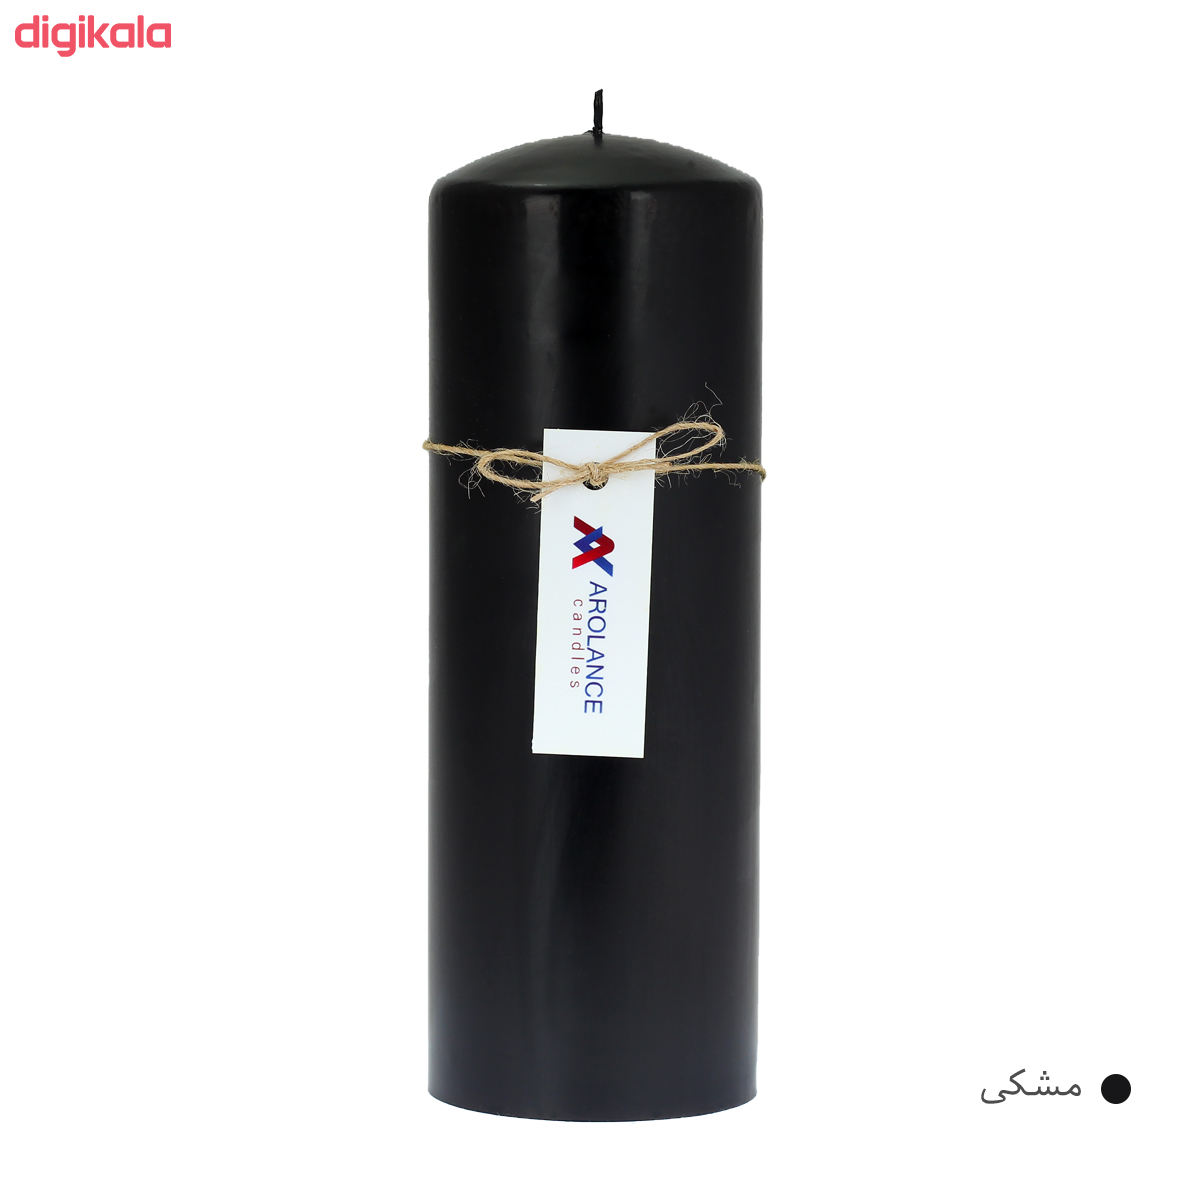 شمع آرولنس طرح استوانه مدل D720 main 1 5